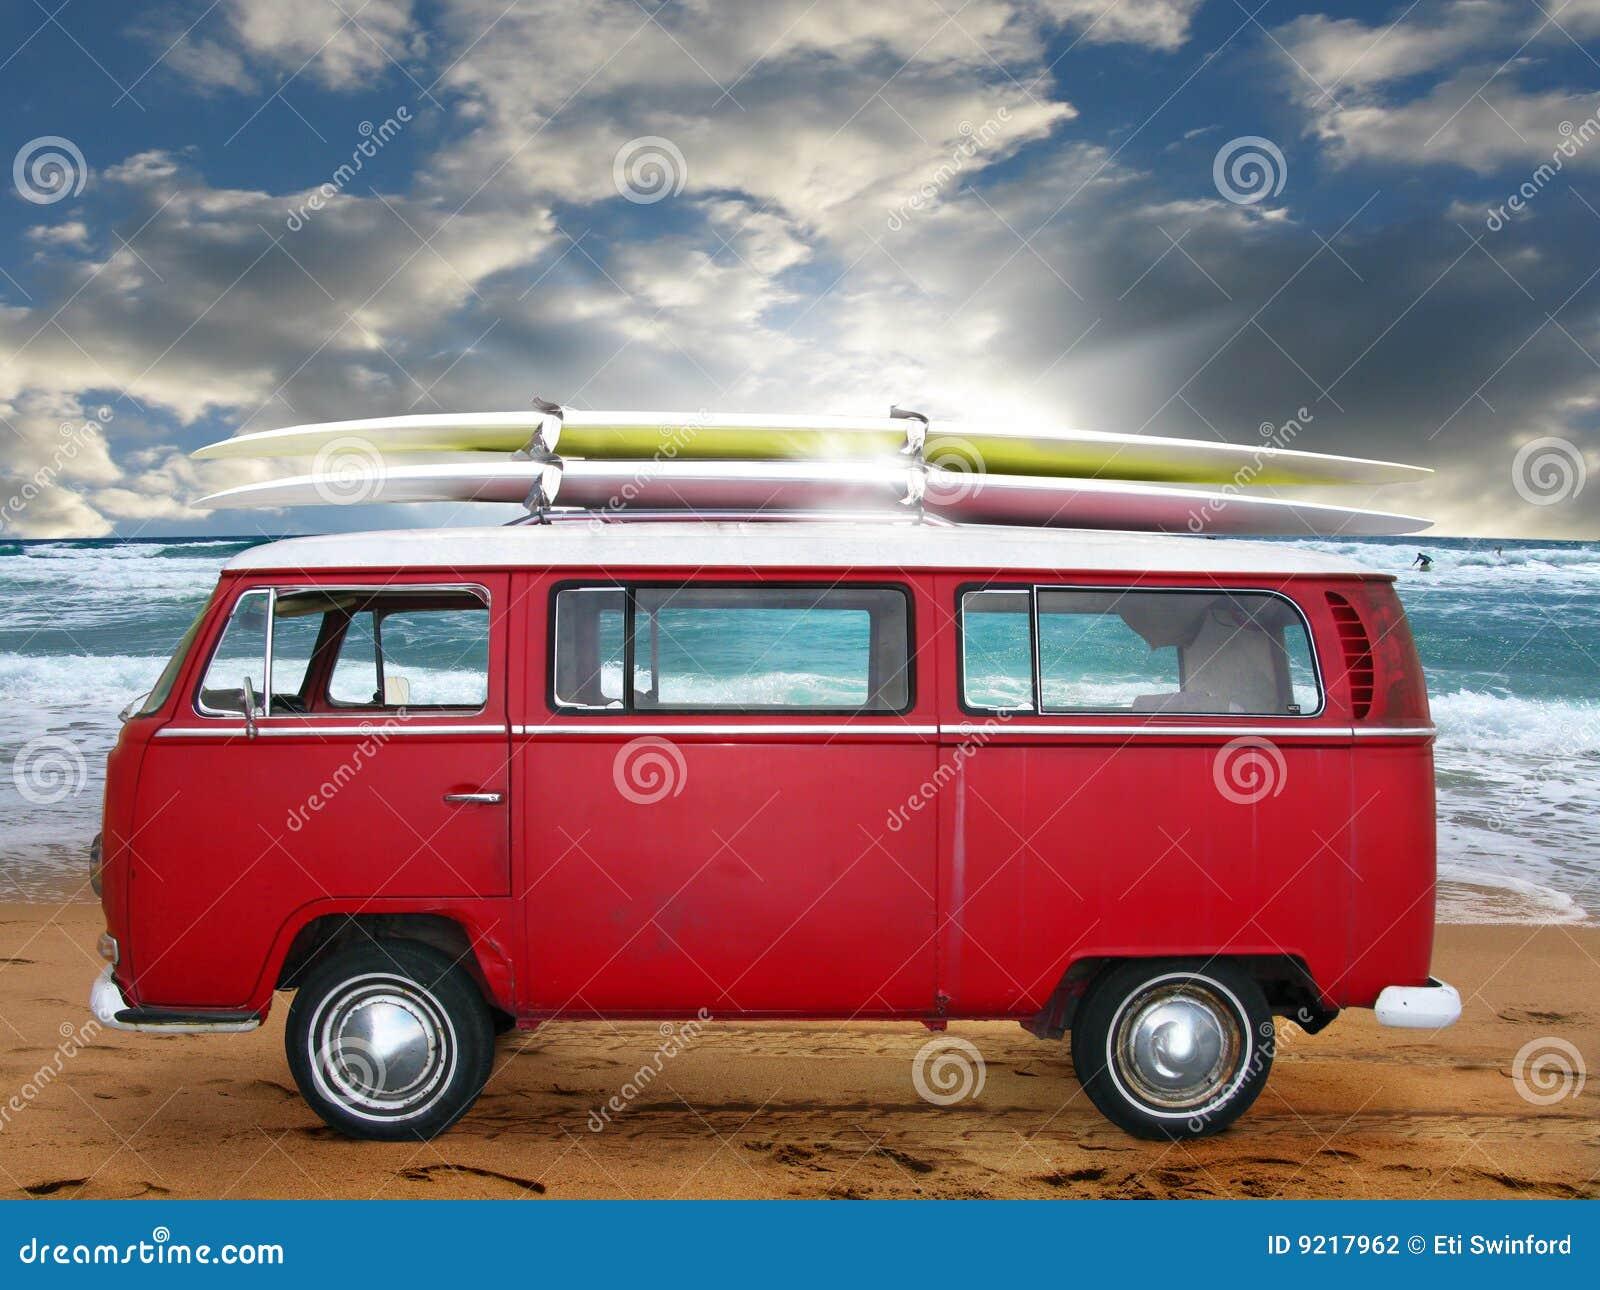 Vw Bug Camper >> Vintage red van stock photo. Image of volkswagen, antique - 9217962